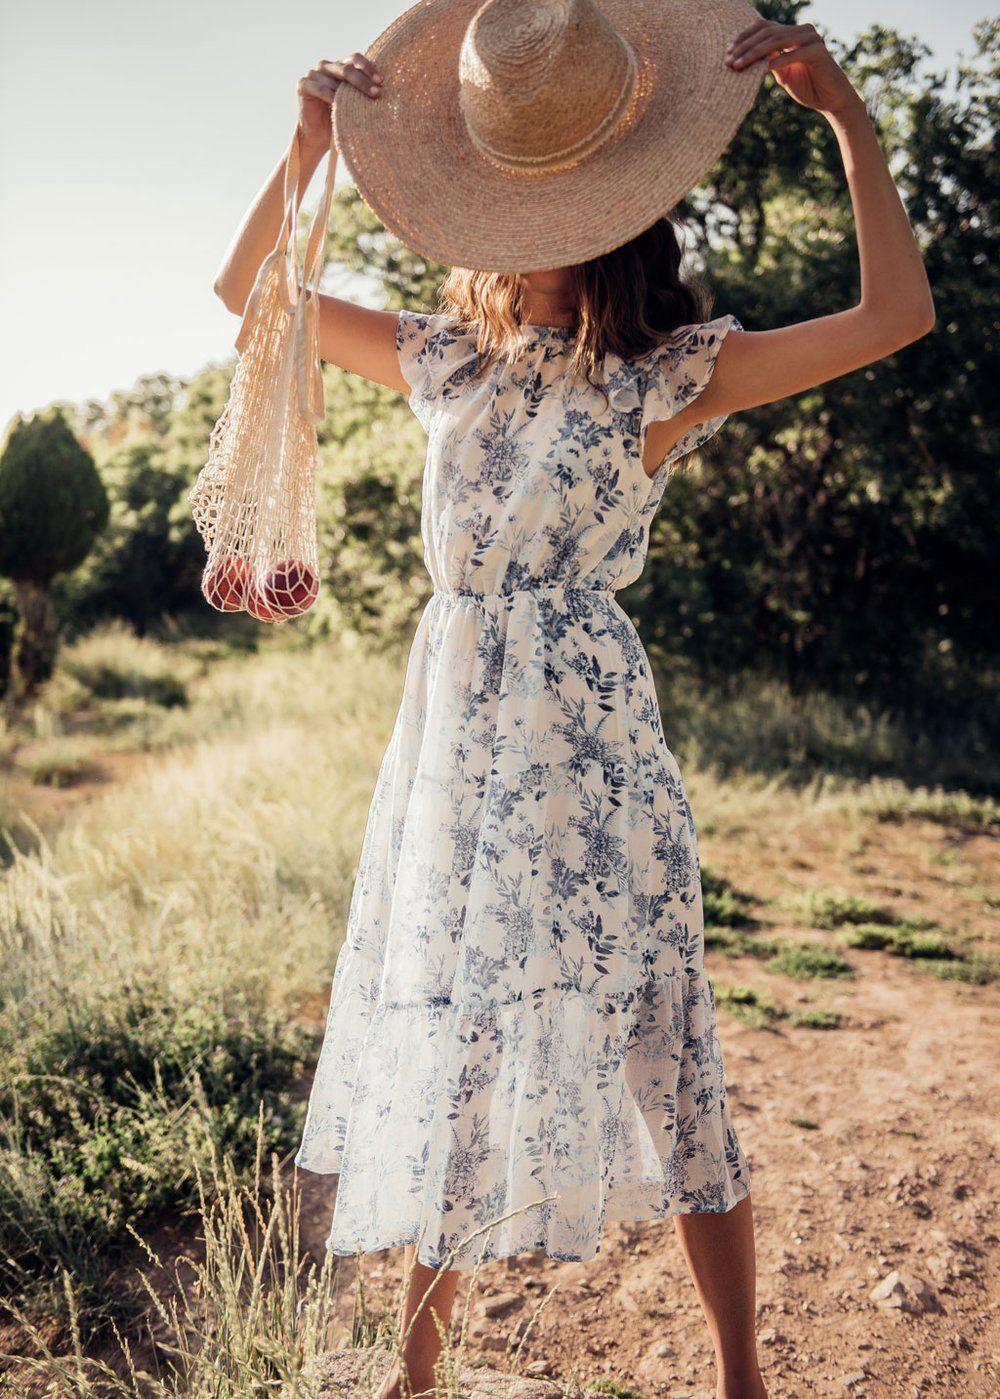 Waterloo Floral Dress - JessaKae, summer shoot, model, photoshoot, womens  fashion, modest fashion, blogger, OOTD, brown… | Flowy dress, Floral dress,  Modest fashion